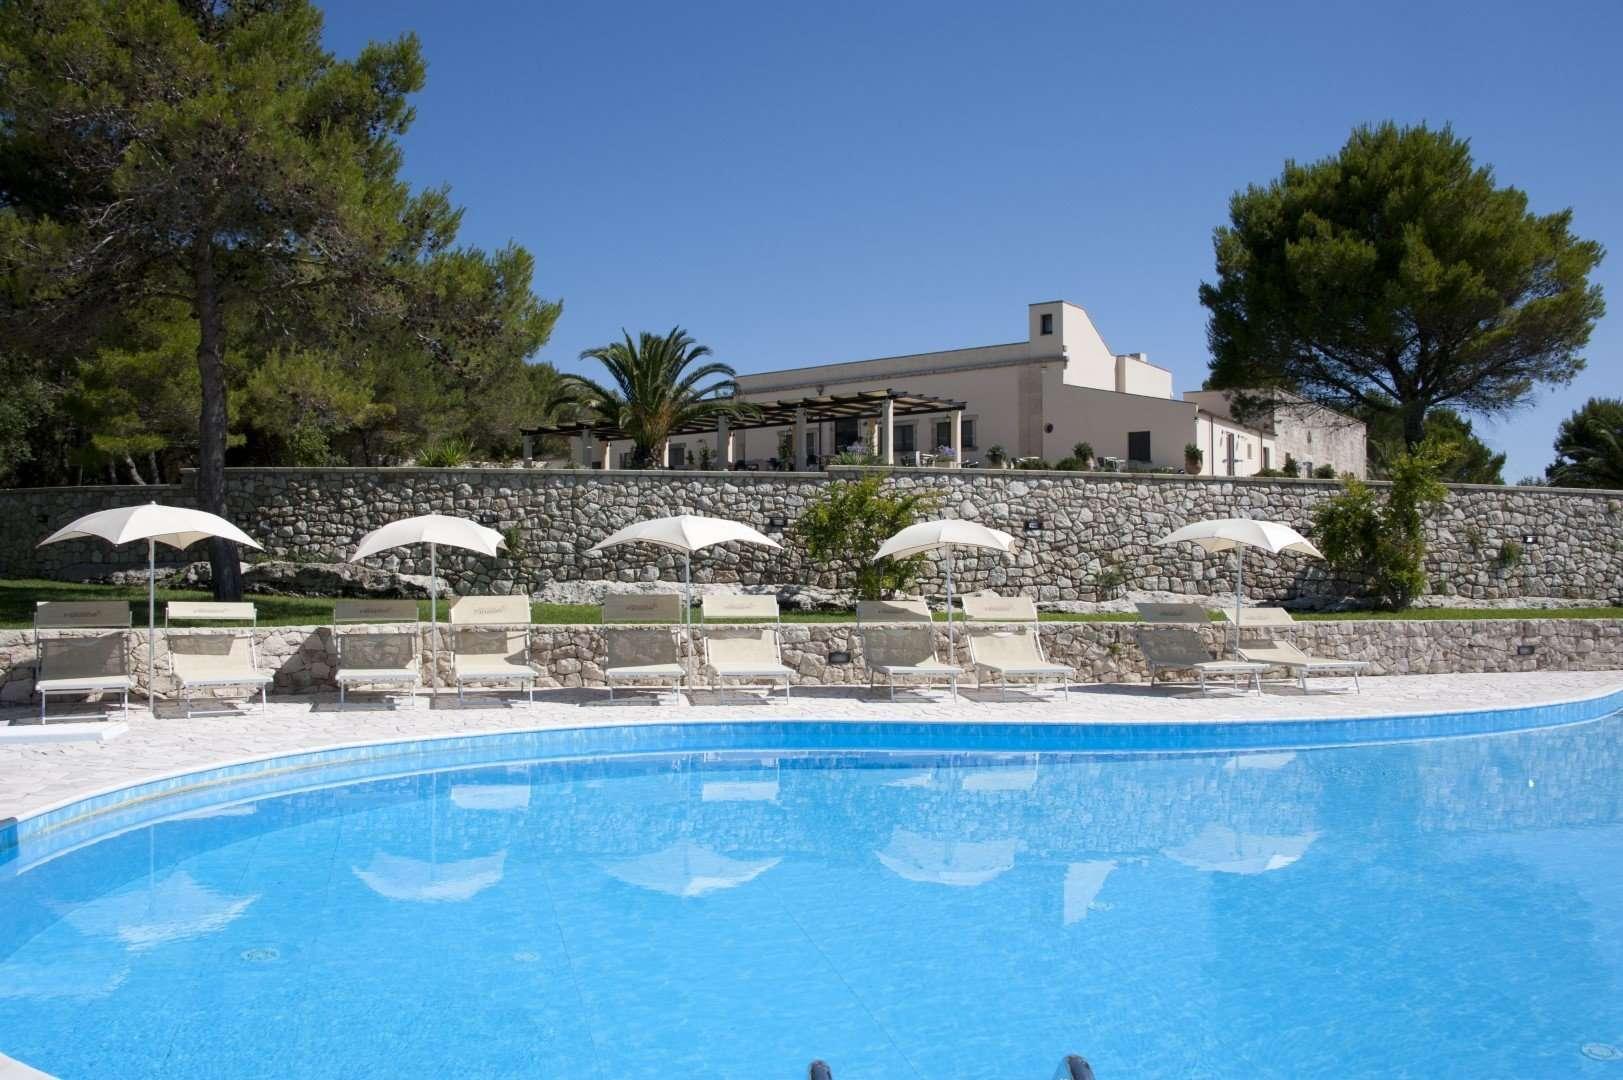 masseria_panareo_puglia_italie_zwembad met ligstoelen